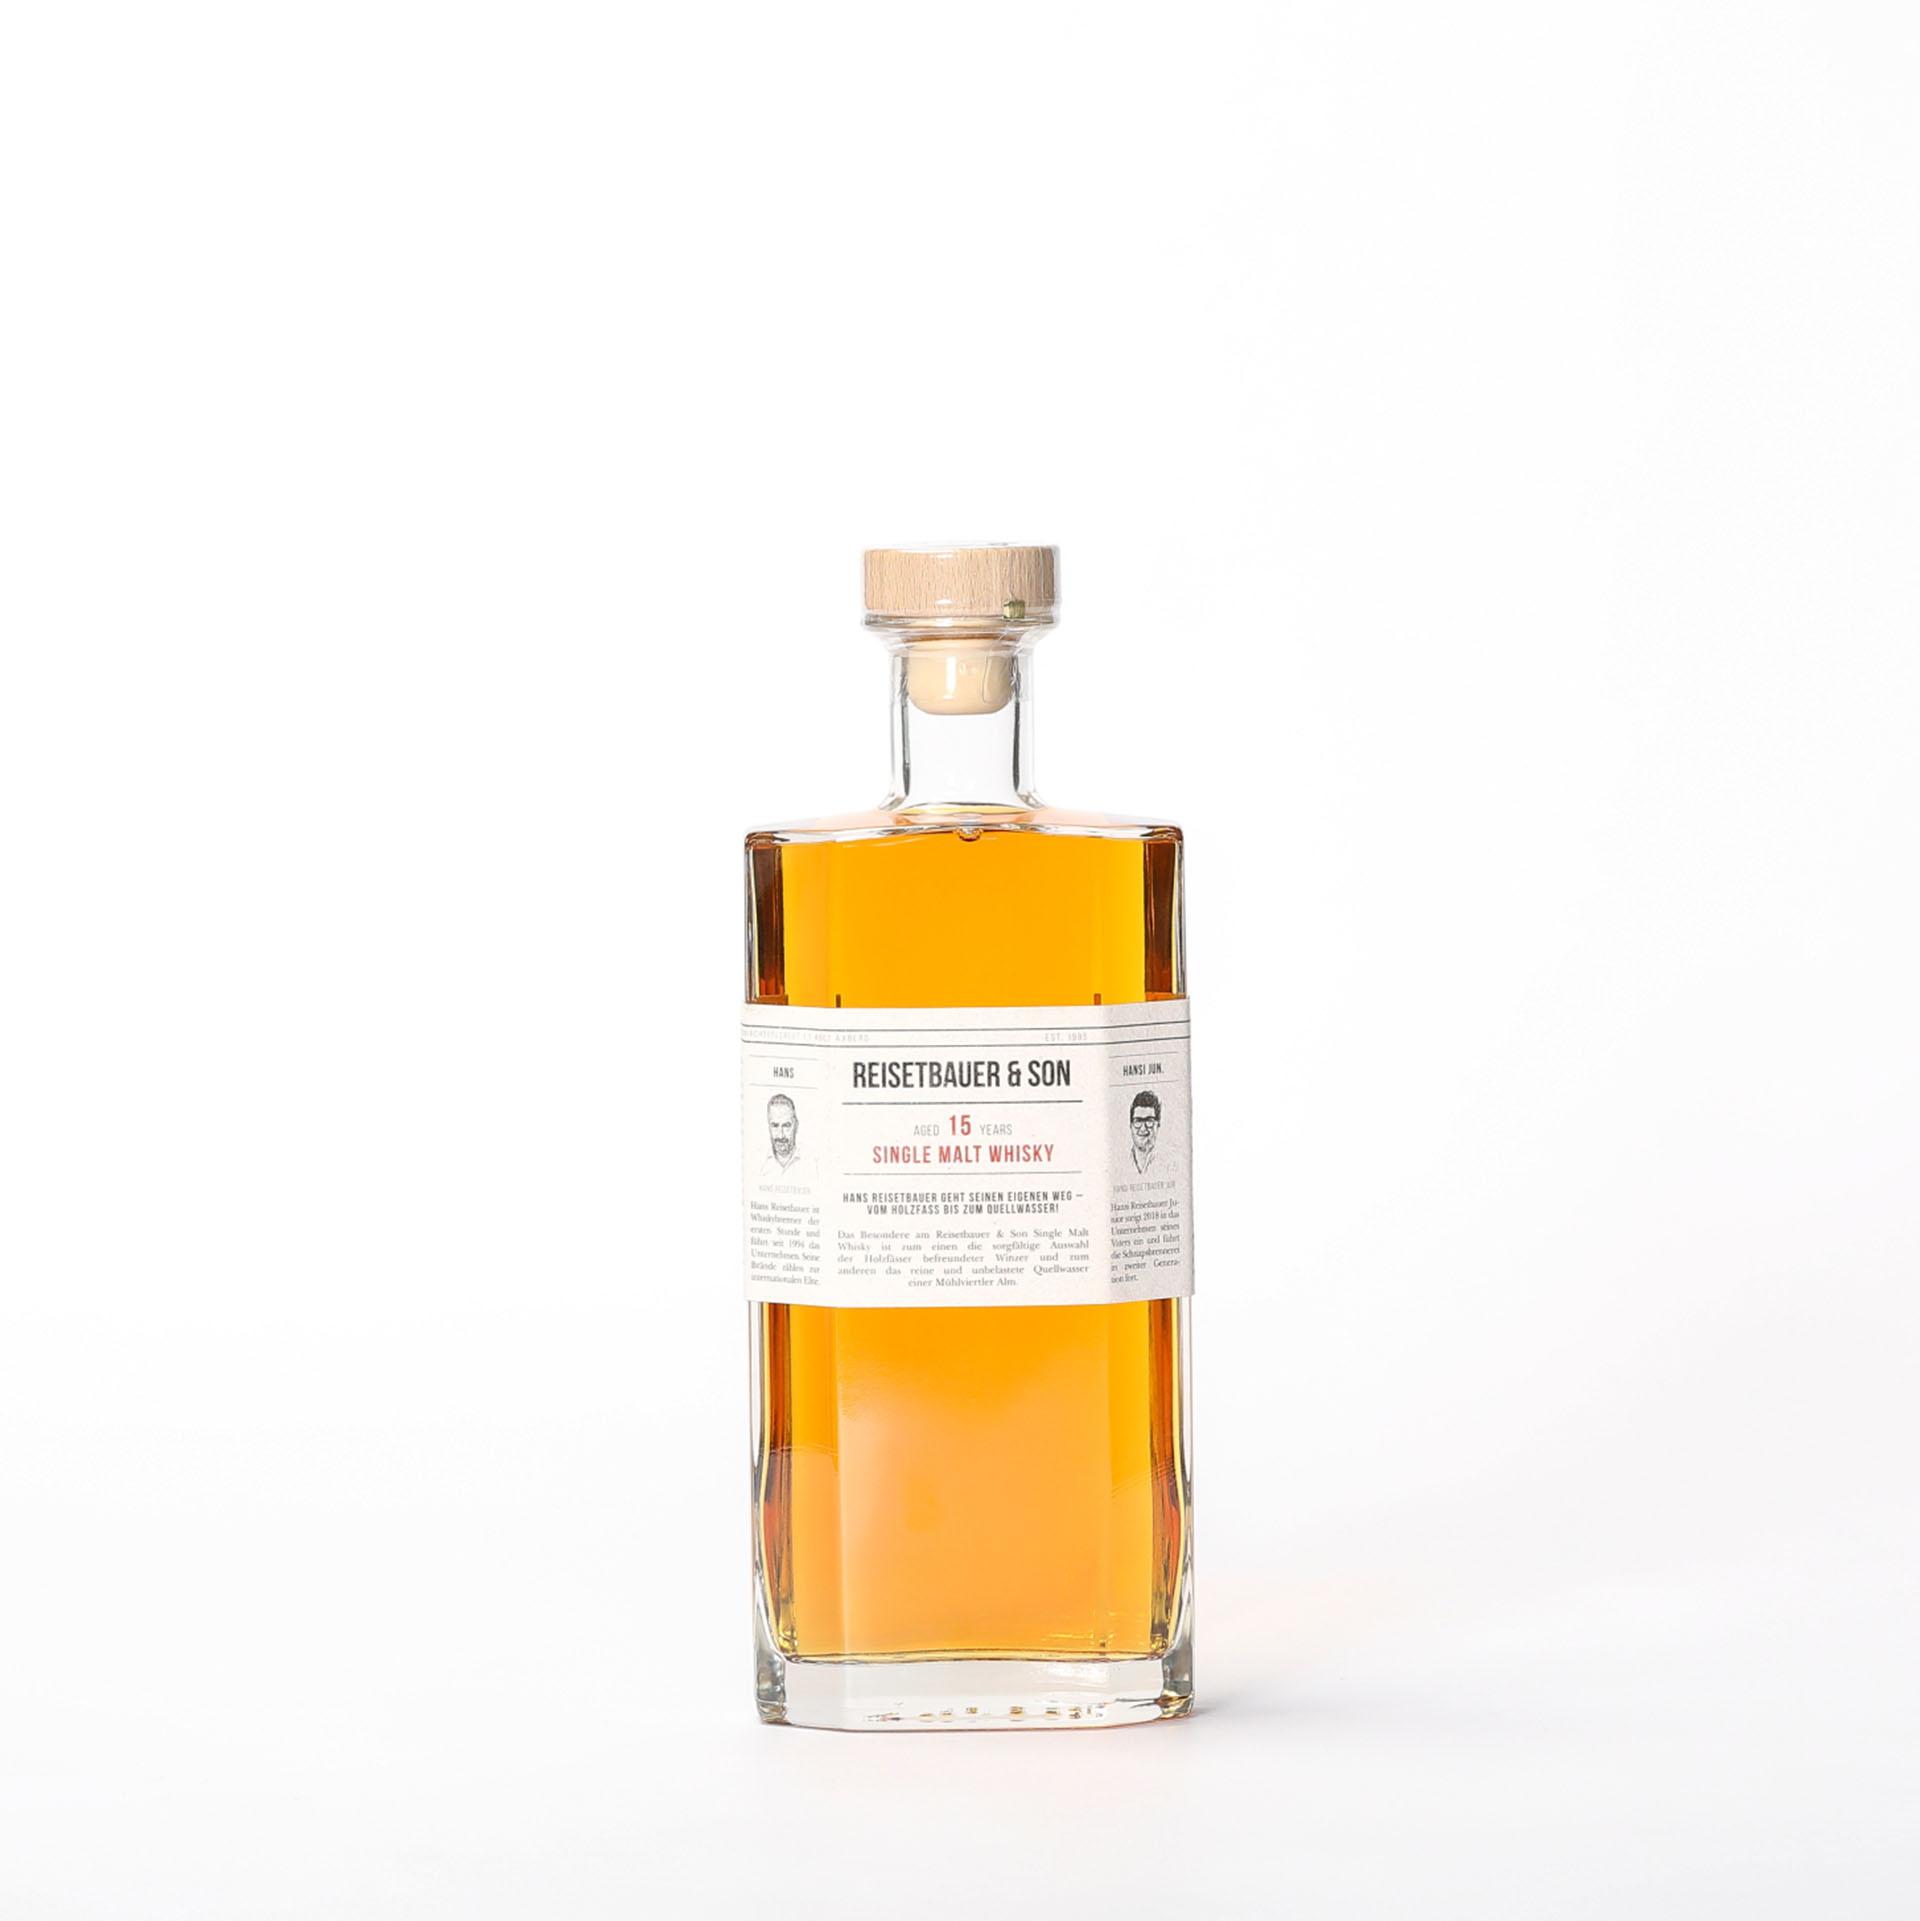 Produktbild Single Malt Whisky 15 years  - Reisetbauer & Son| DINZLER Kaffeerösterei